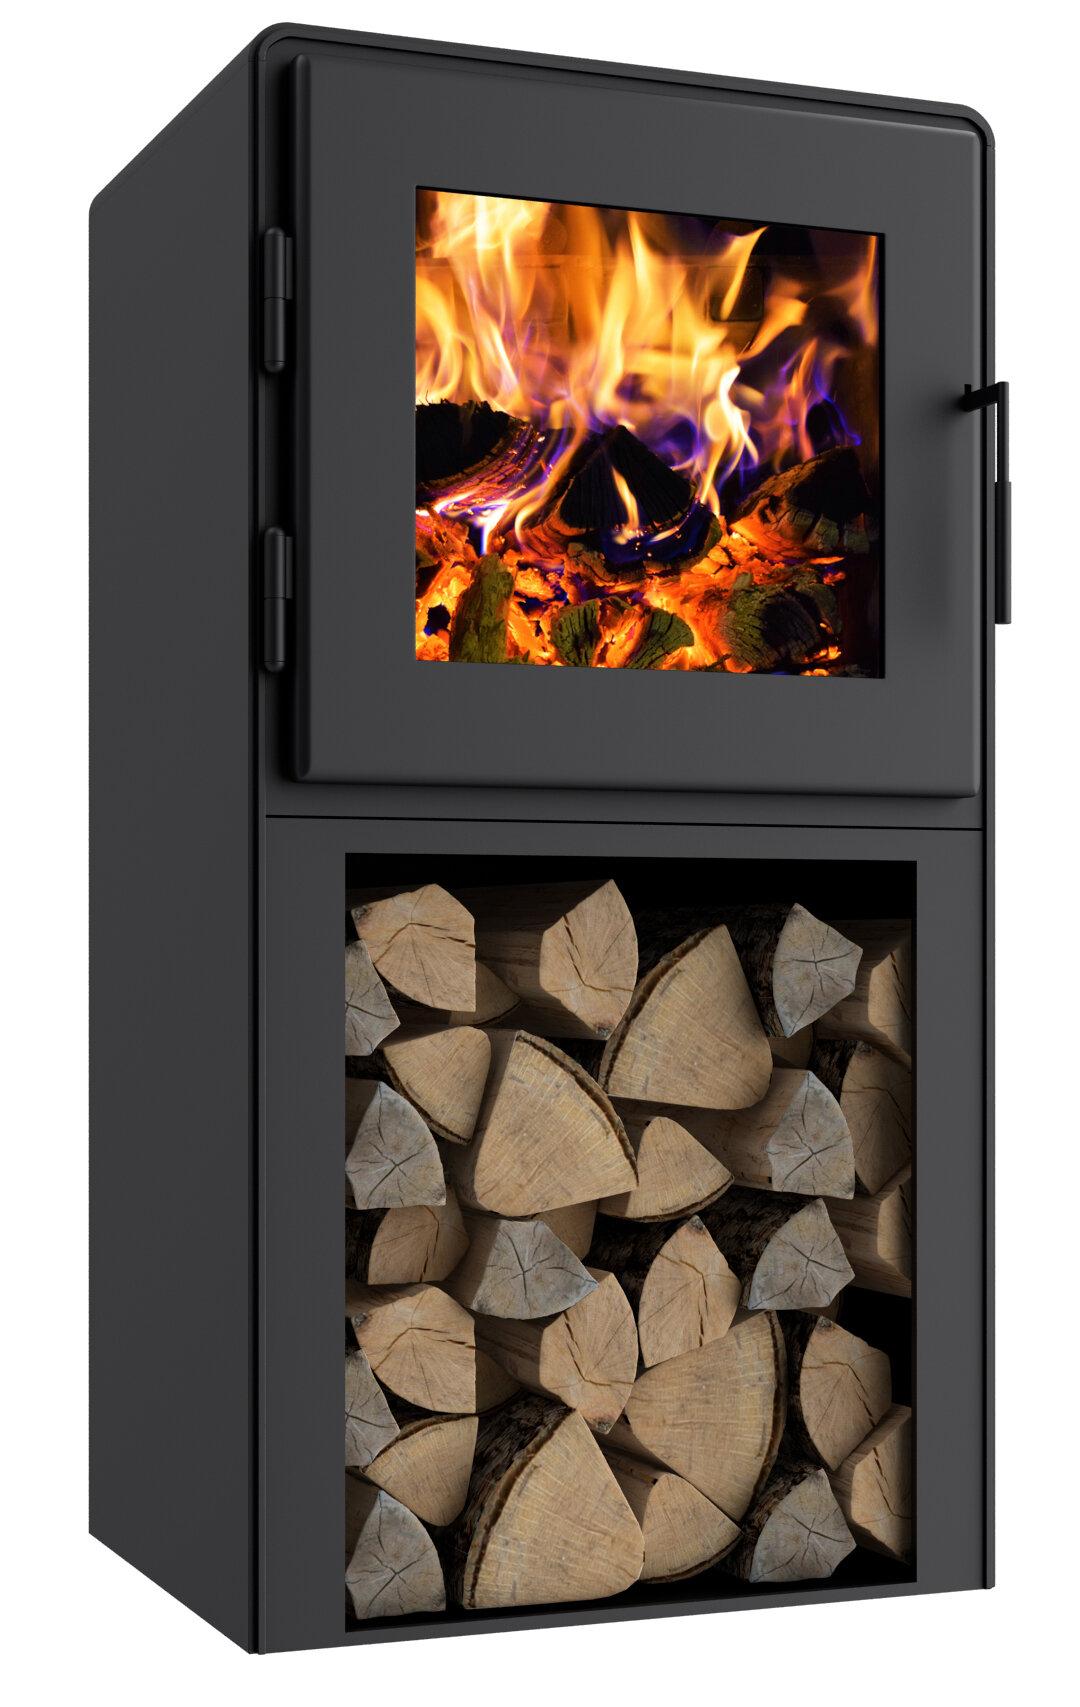 Mf Fire Nova 1500 Sq Ft Direct Vent Freestanding Wood Stove Wayfair